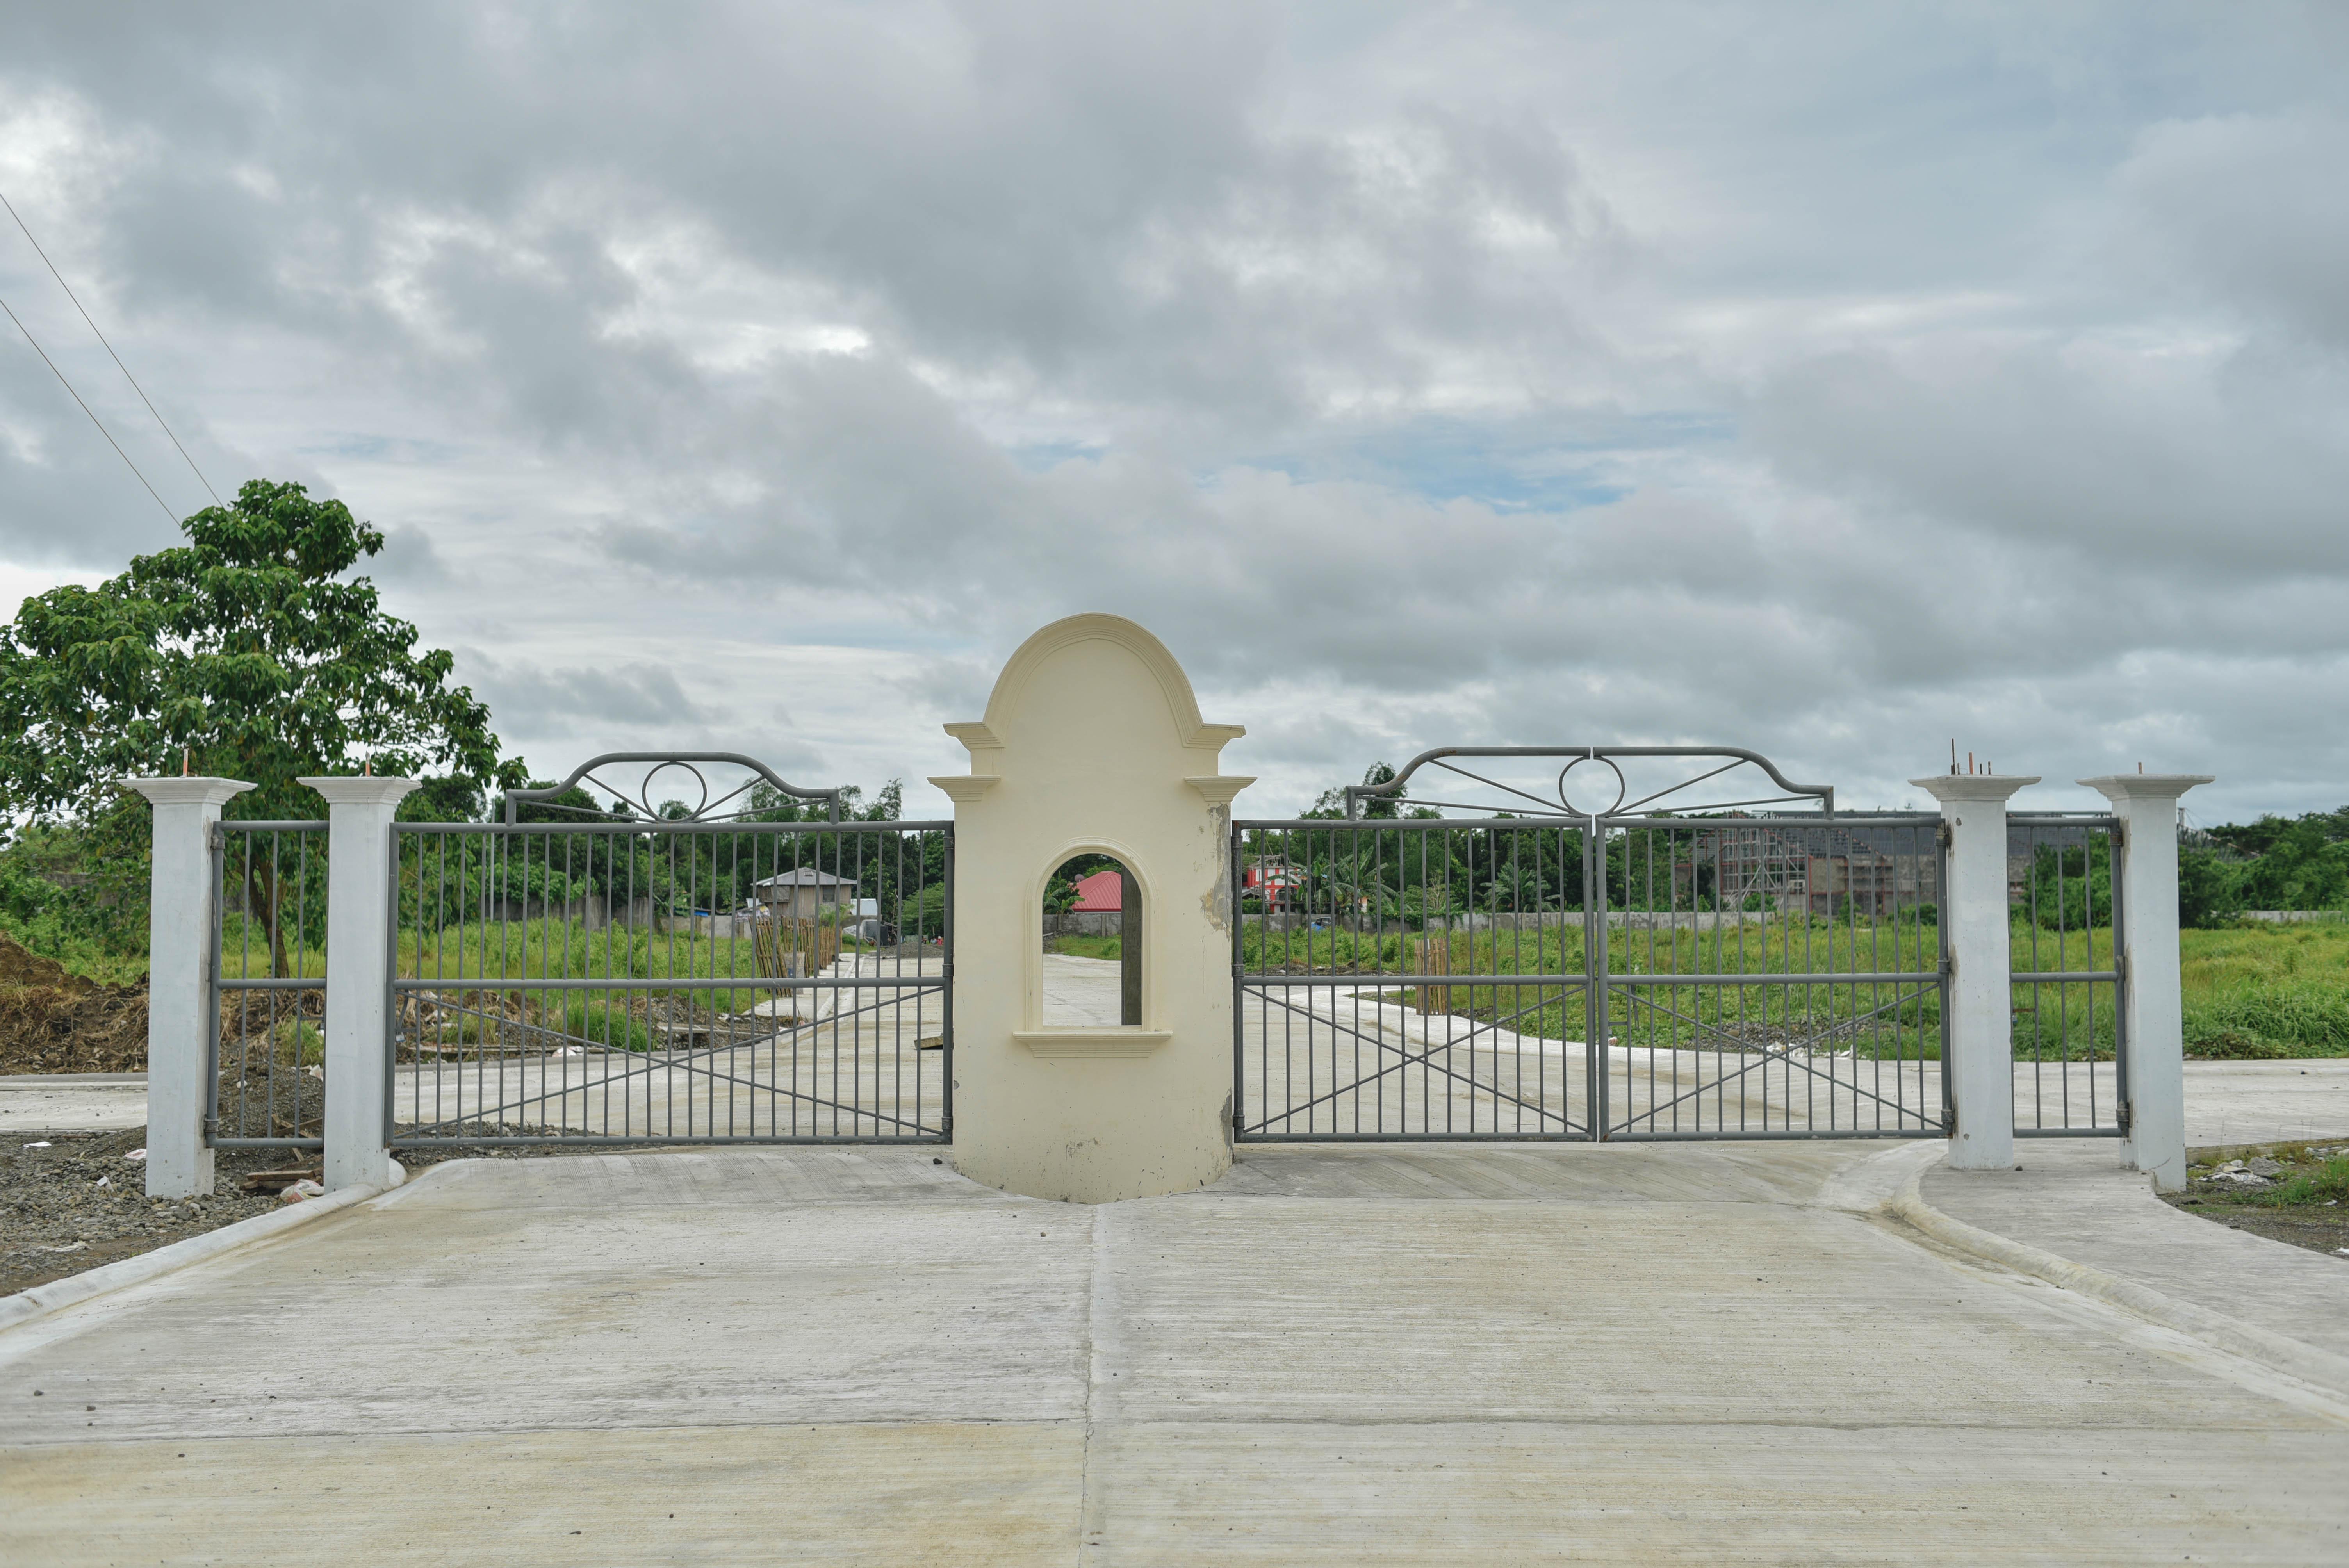 Villa San Manuel Subd. Gate